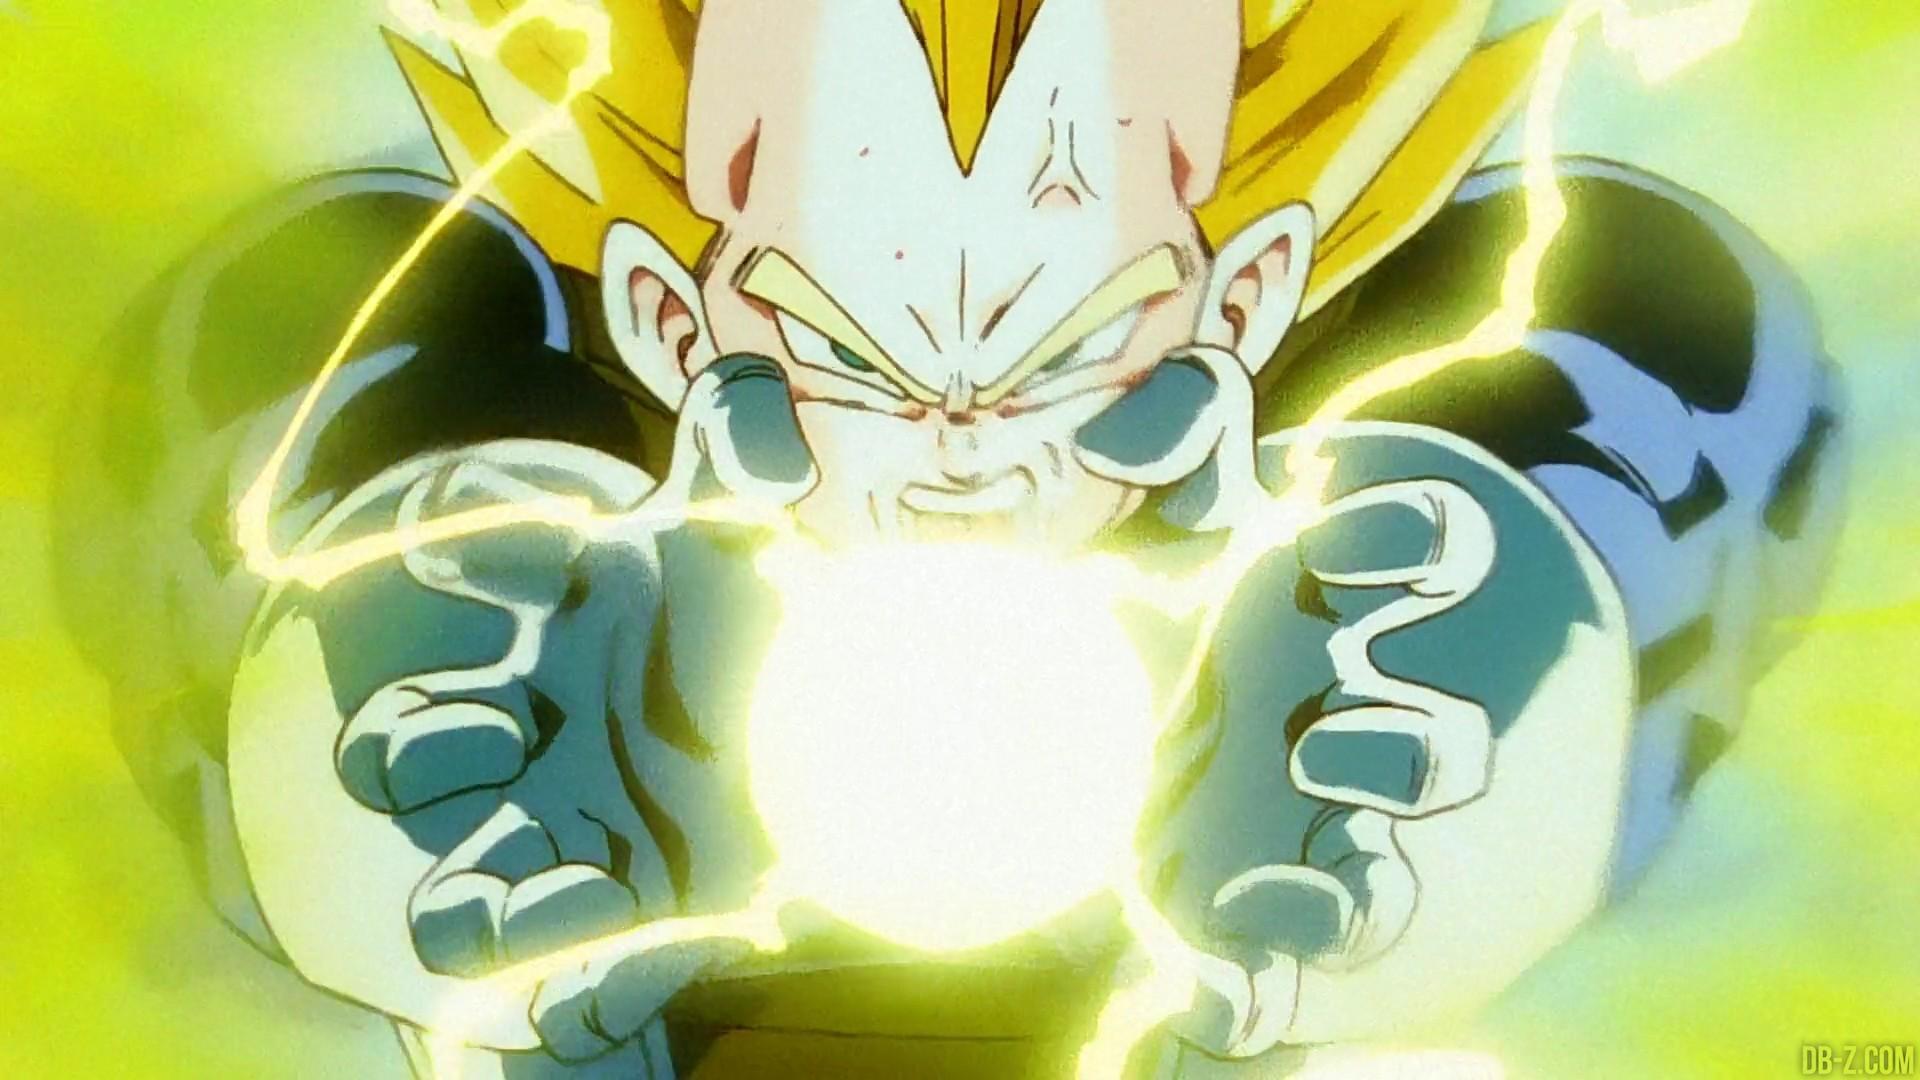 http://www.db-z.com/wp-content/uploads/2016/03/Final-Flash-Vegeta-vs-Cell-12.jpg